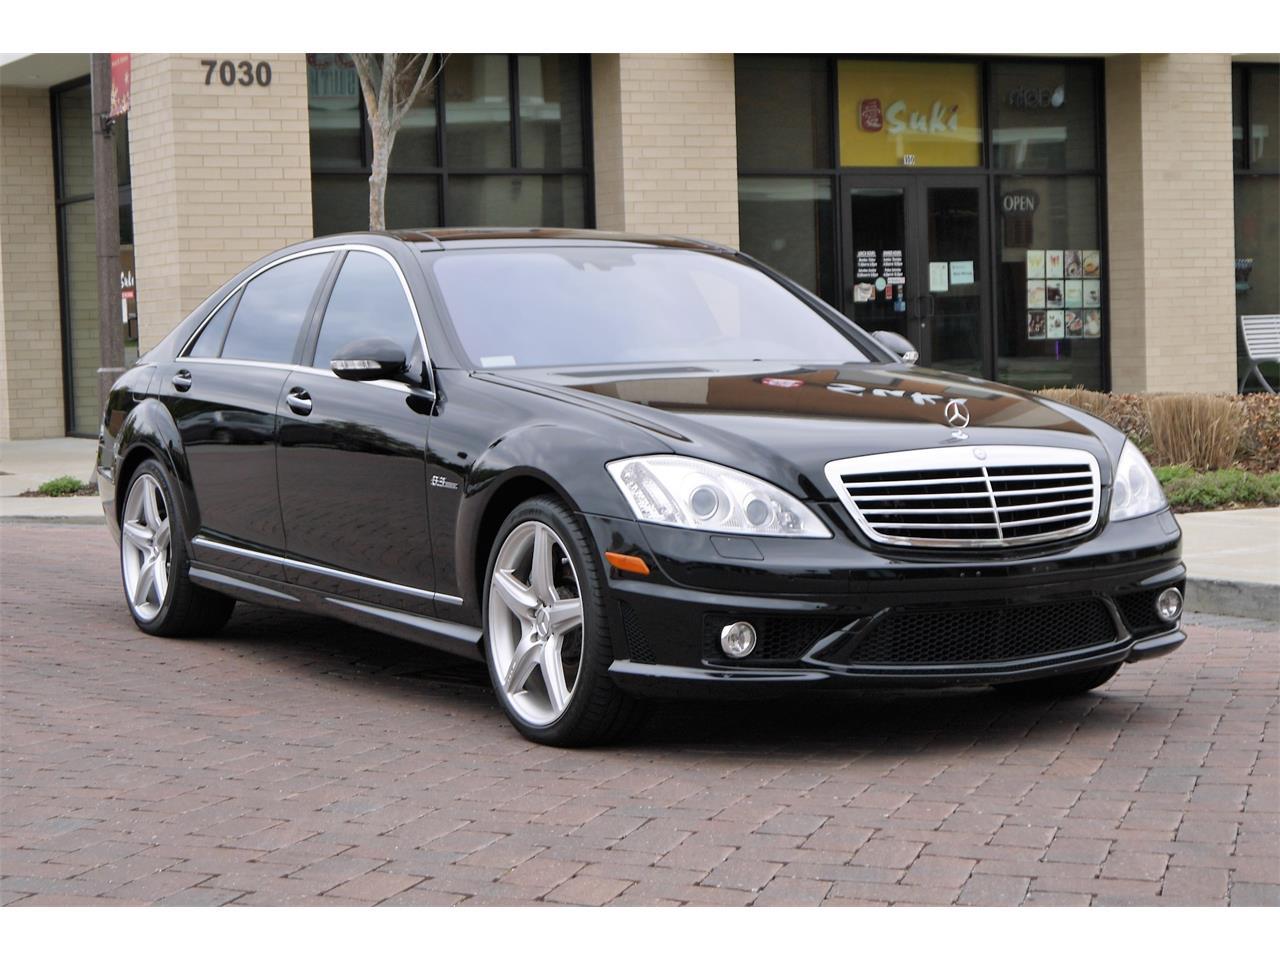 2008 Mercedes-Benz S-Class for Sale | ClassicCars.com | CC ...